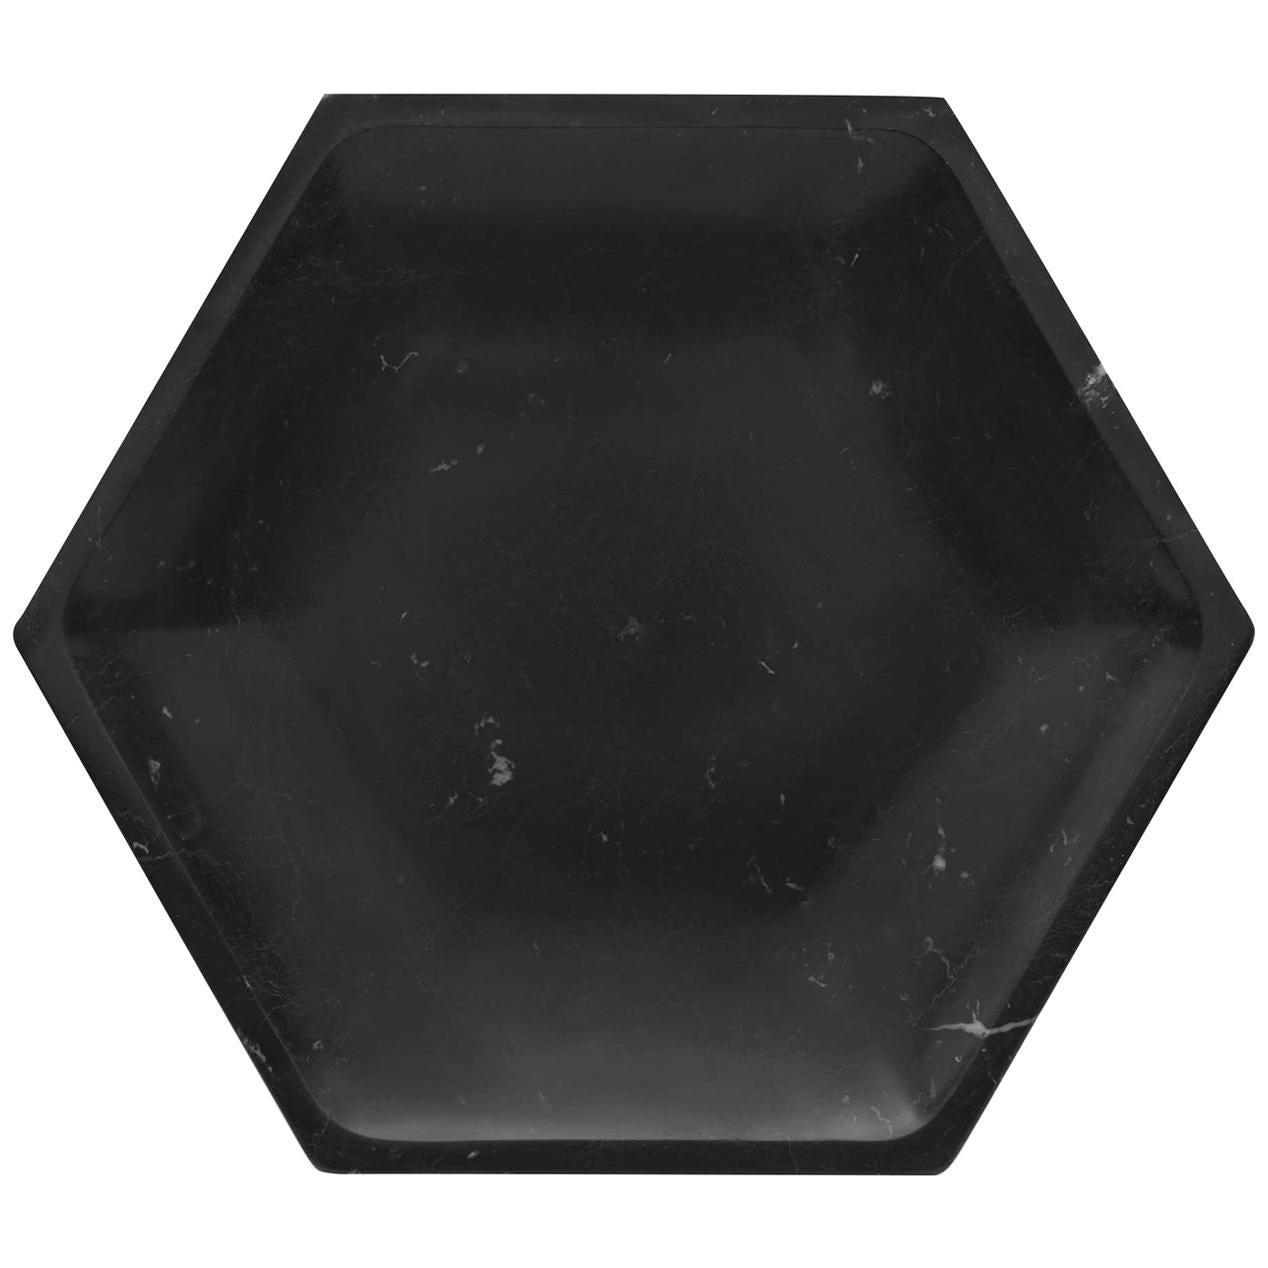 Black Gina Fruit Bowl, Design James Irvine, 2011